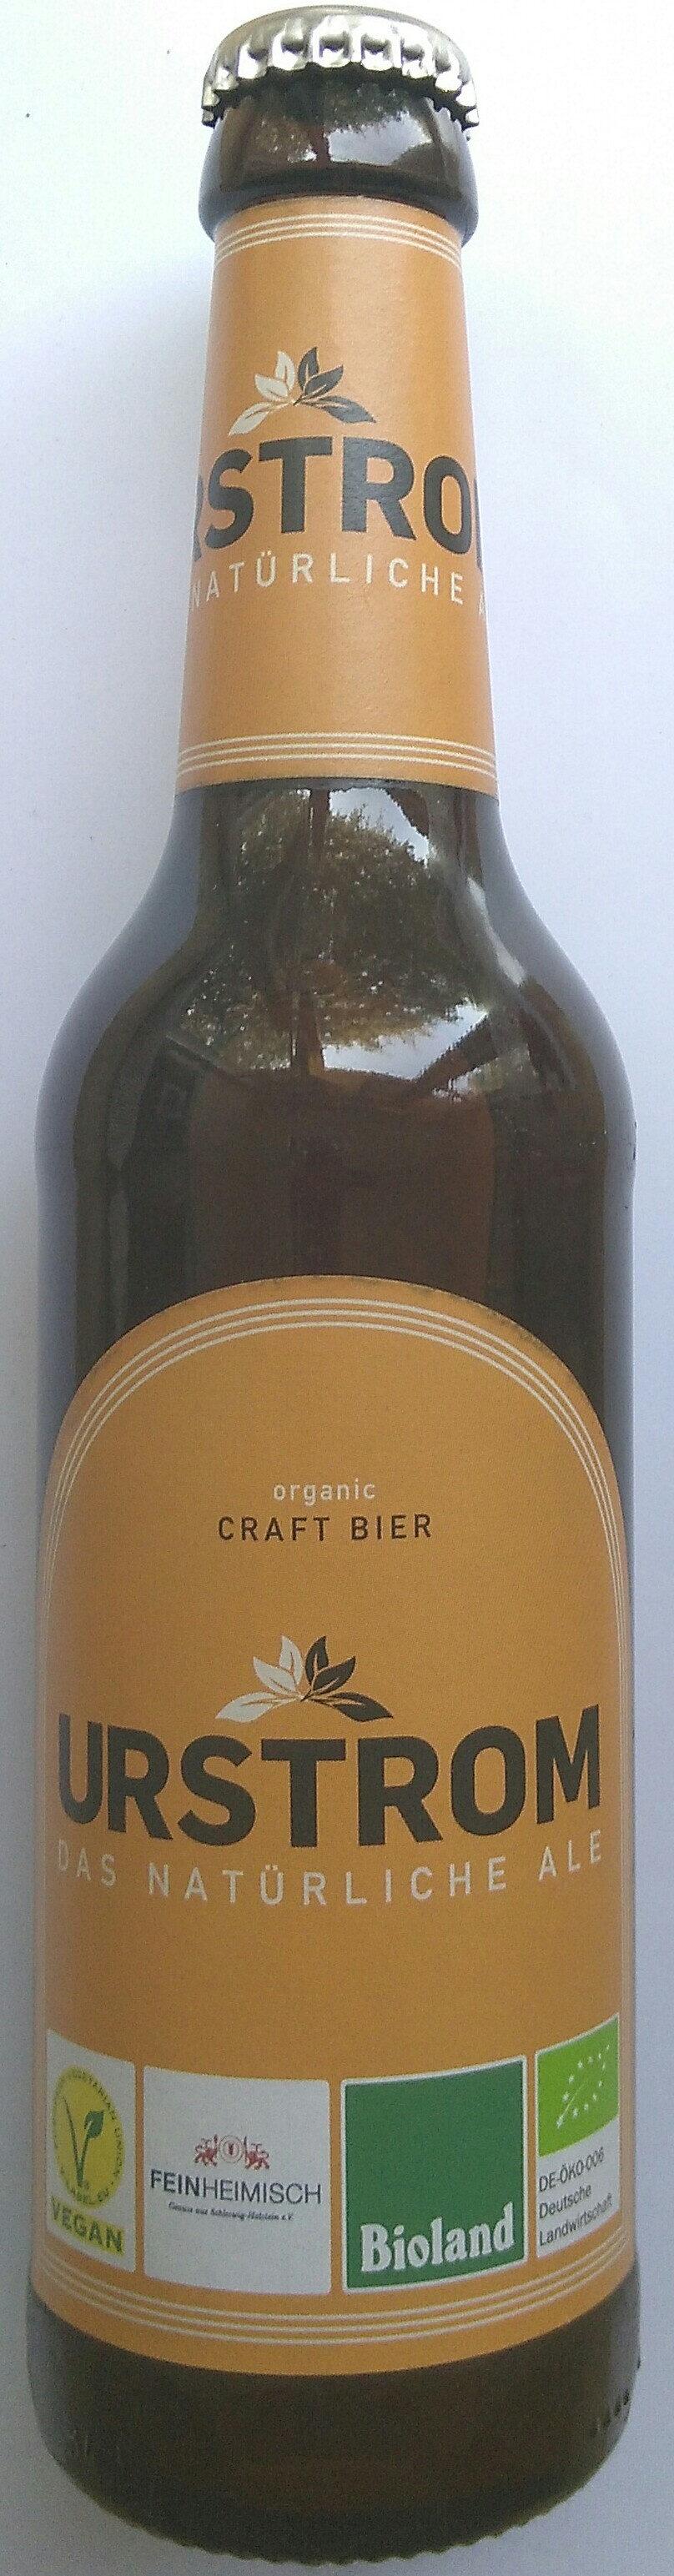 Das natürliche Ale - Product - de